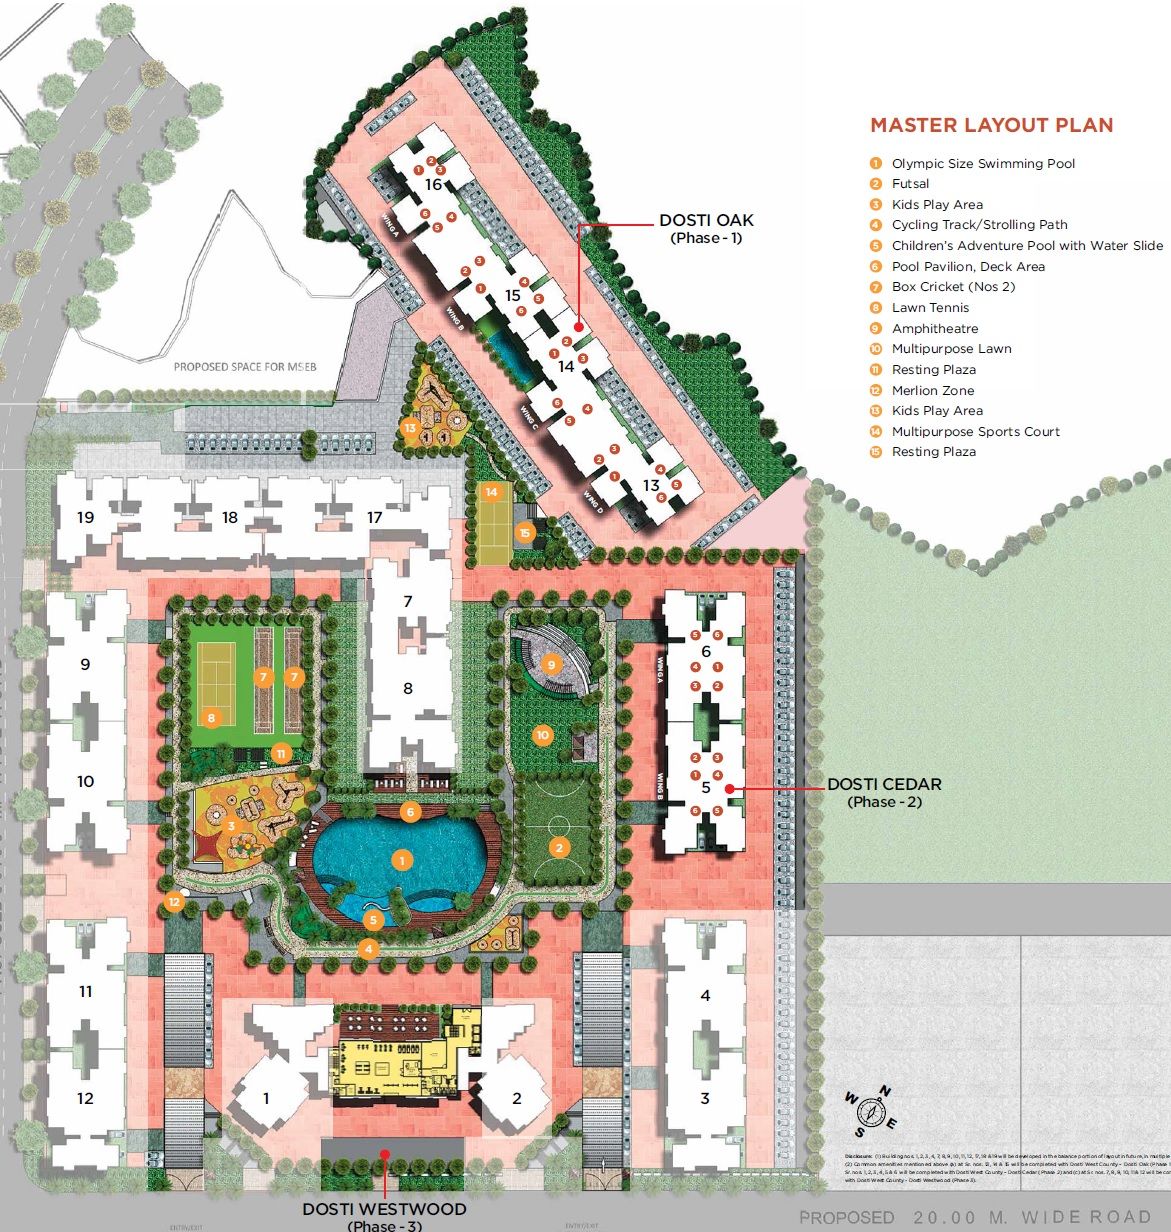 dosti west county master plan image1